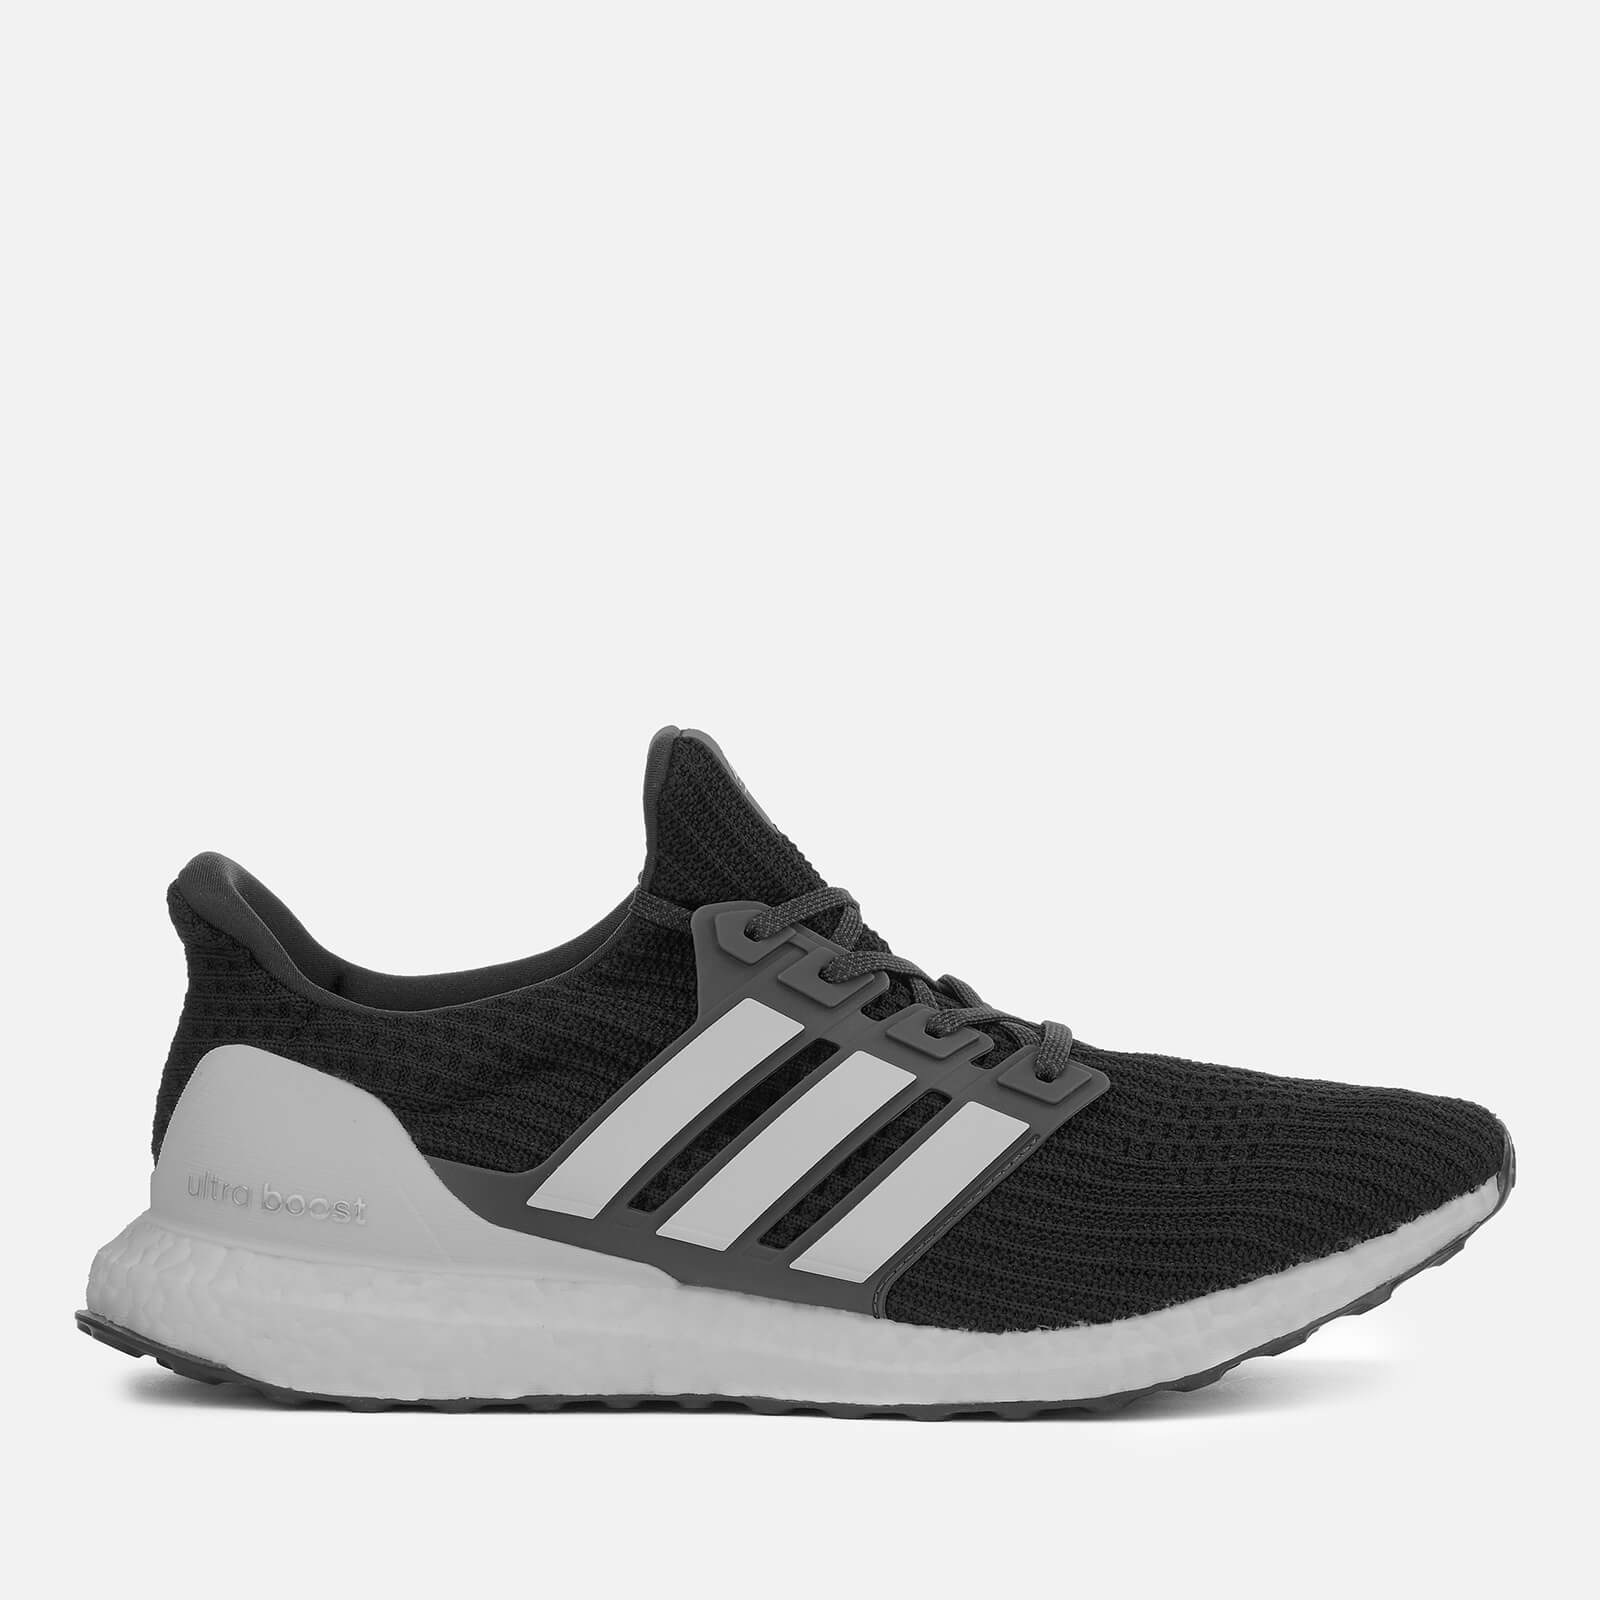 reputable site 61482 23dd4 adidas Men s Ultraboost Trainers - C Black Sports   Leisure   TheHut.com